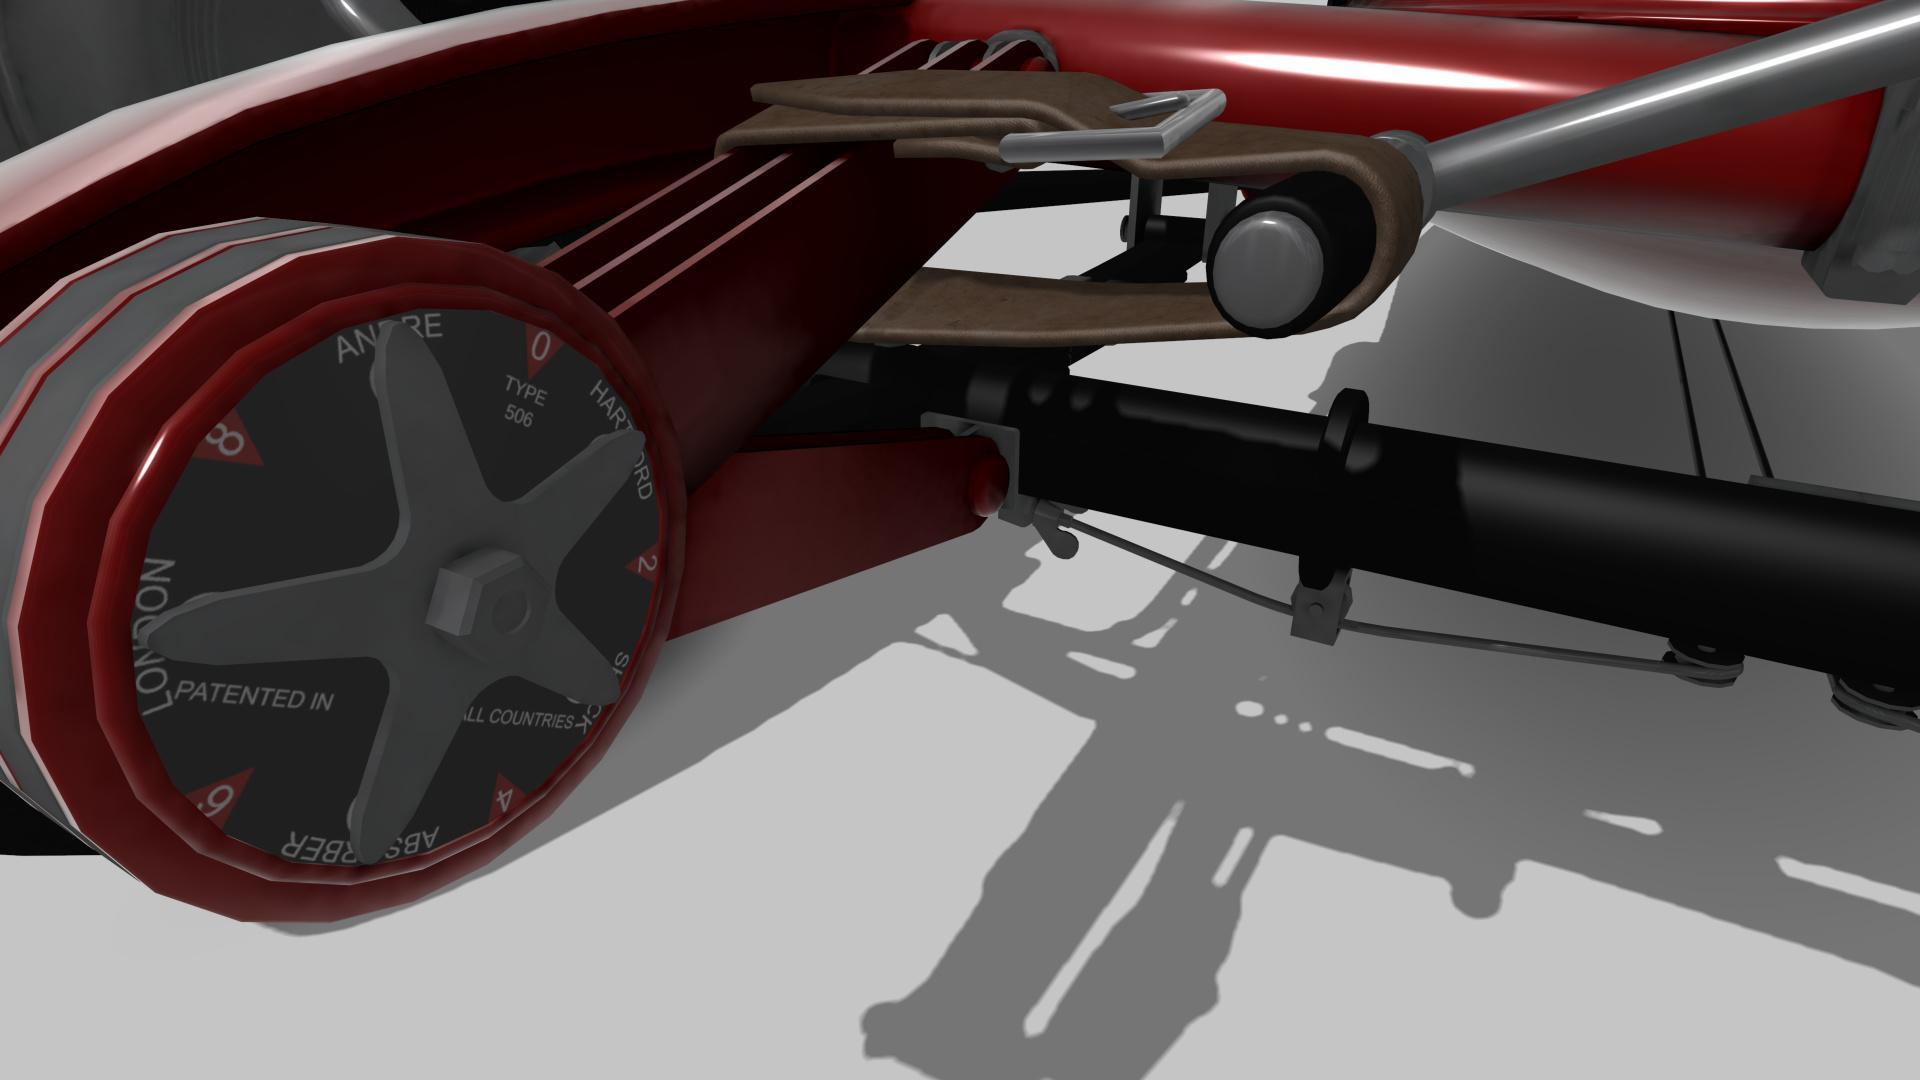 __custom_showroom_1611336739.jpg